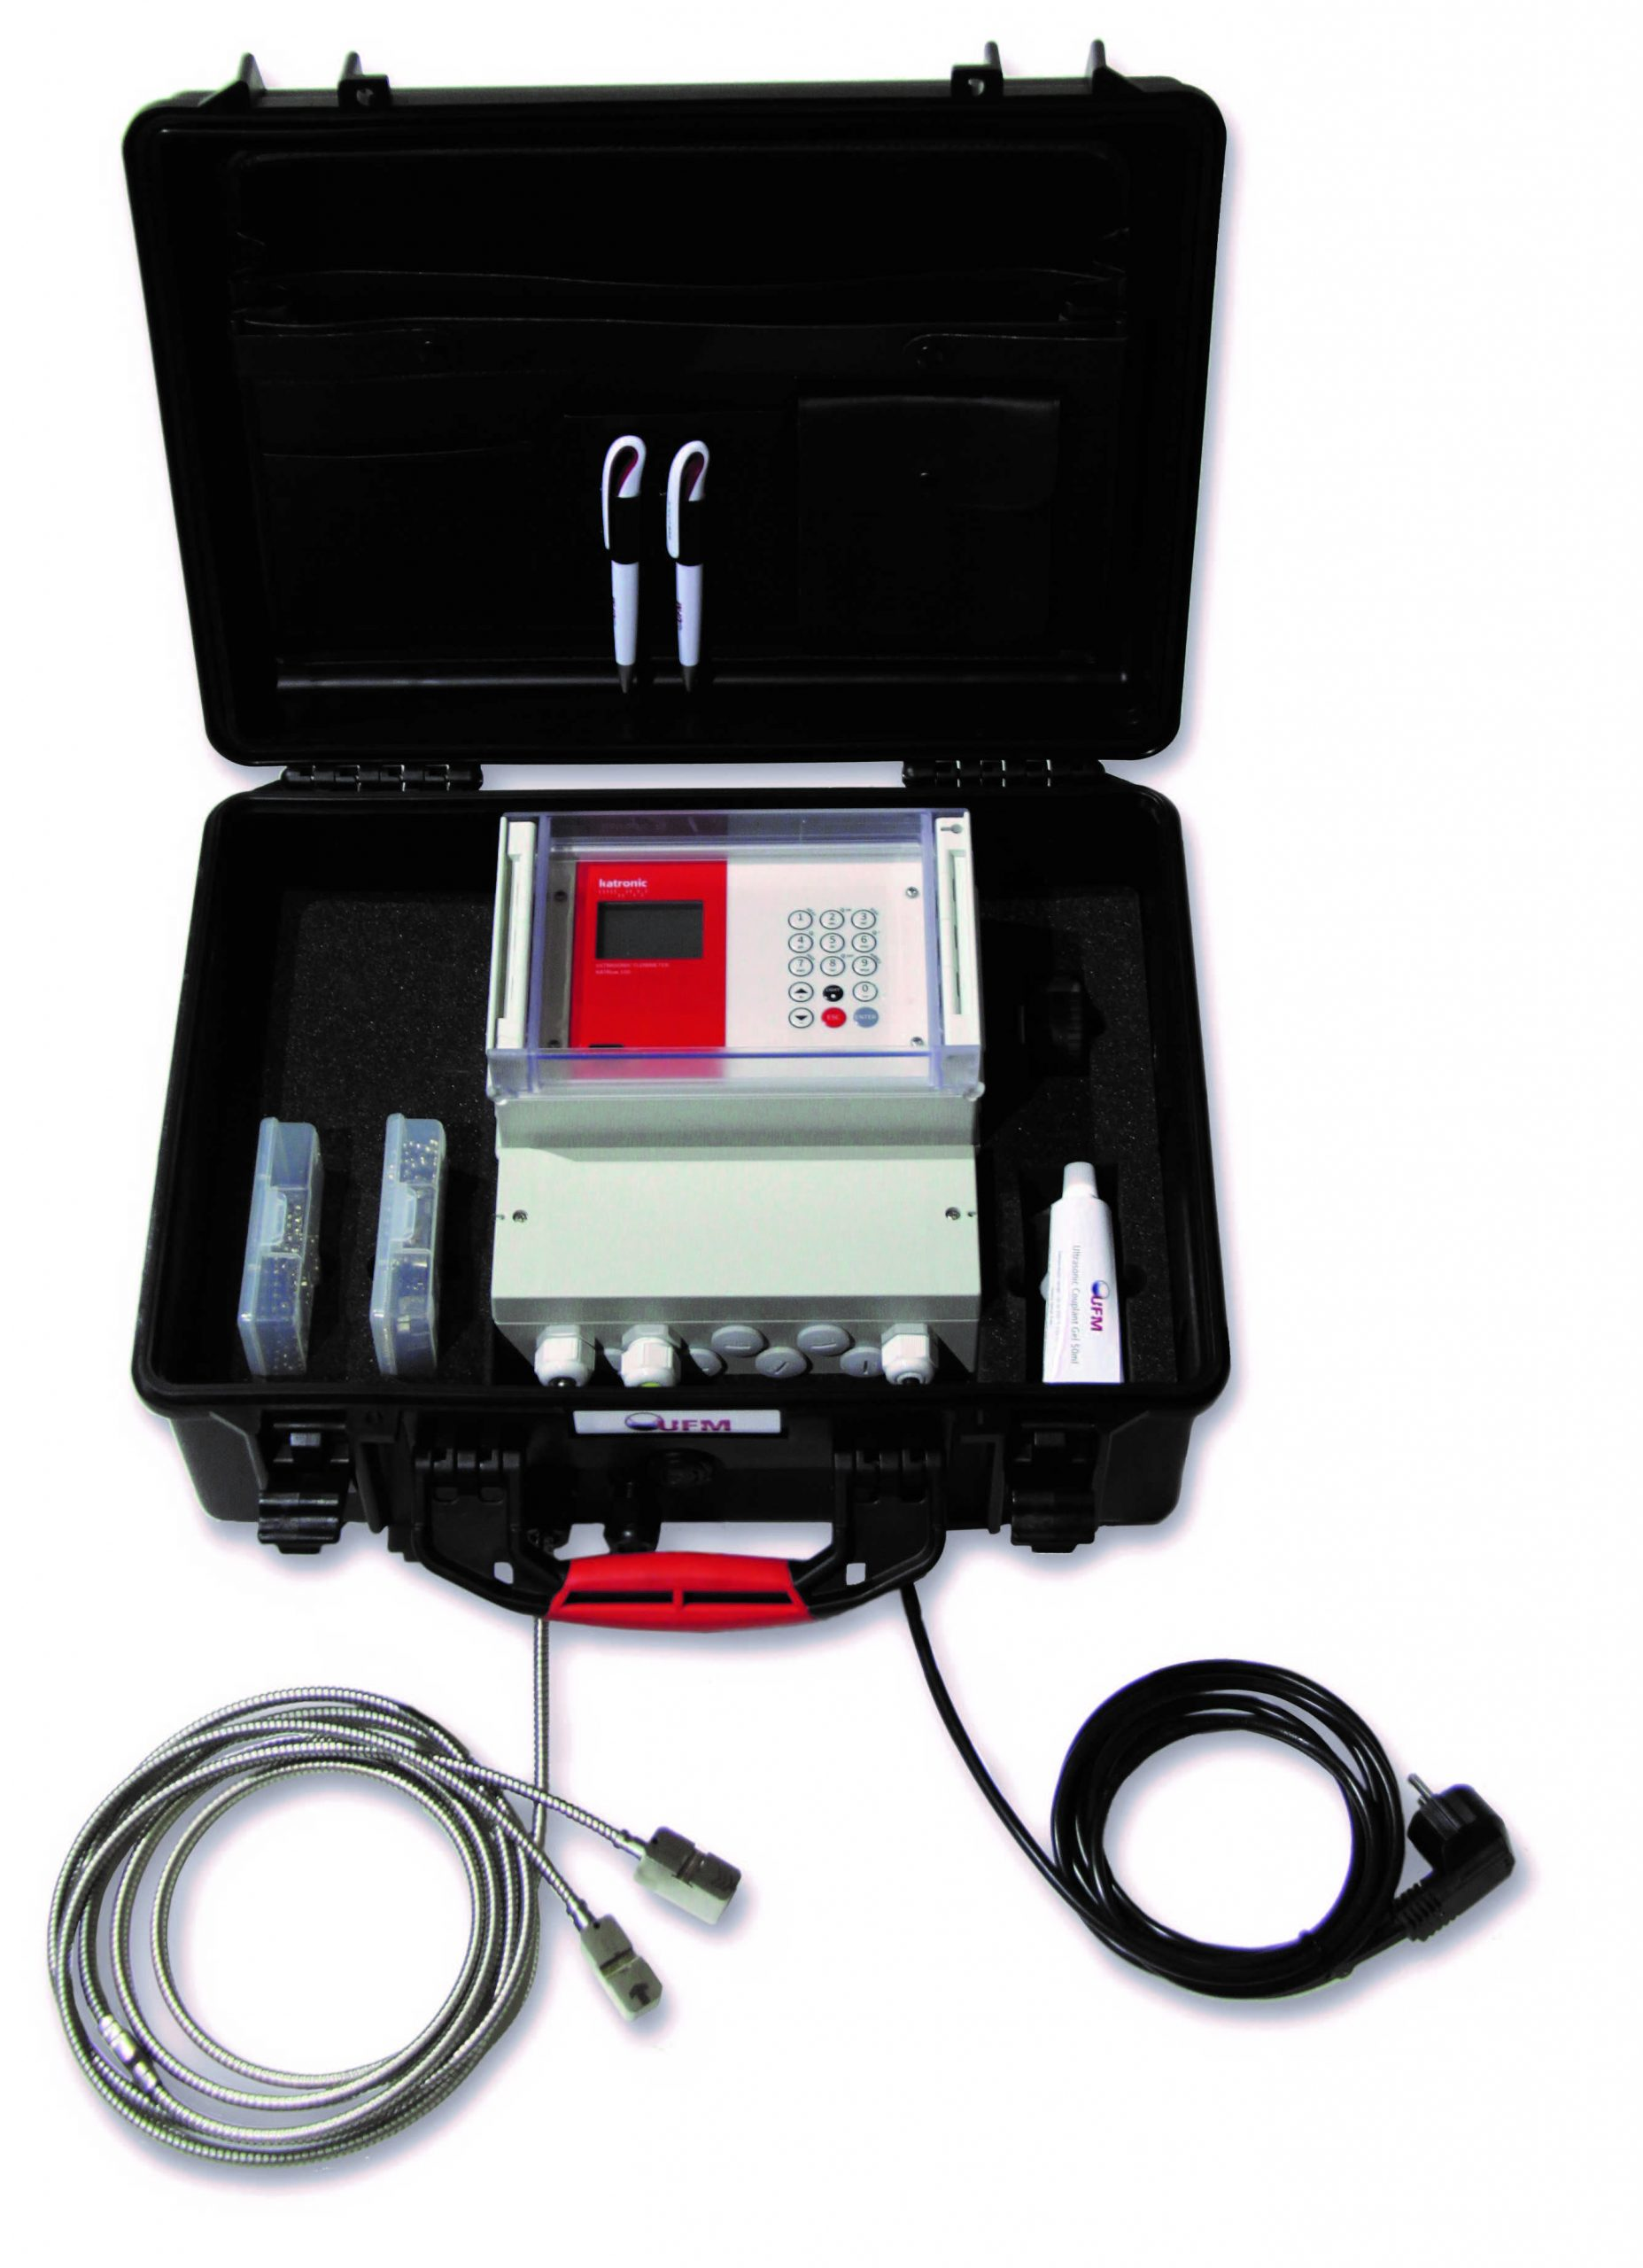 UFM-70 FS - multifunctioneel ultrasoon clamp-on flowmetersysteem in koffer | U-F-M b.v.